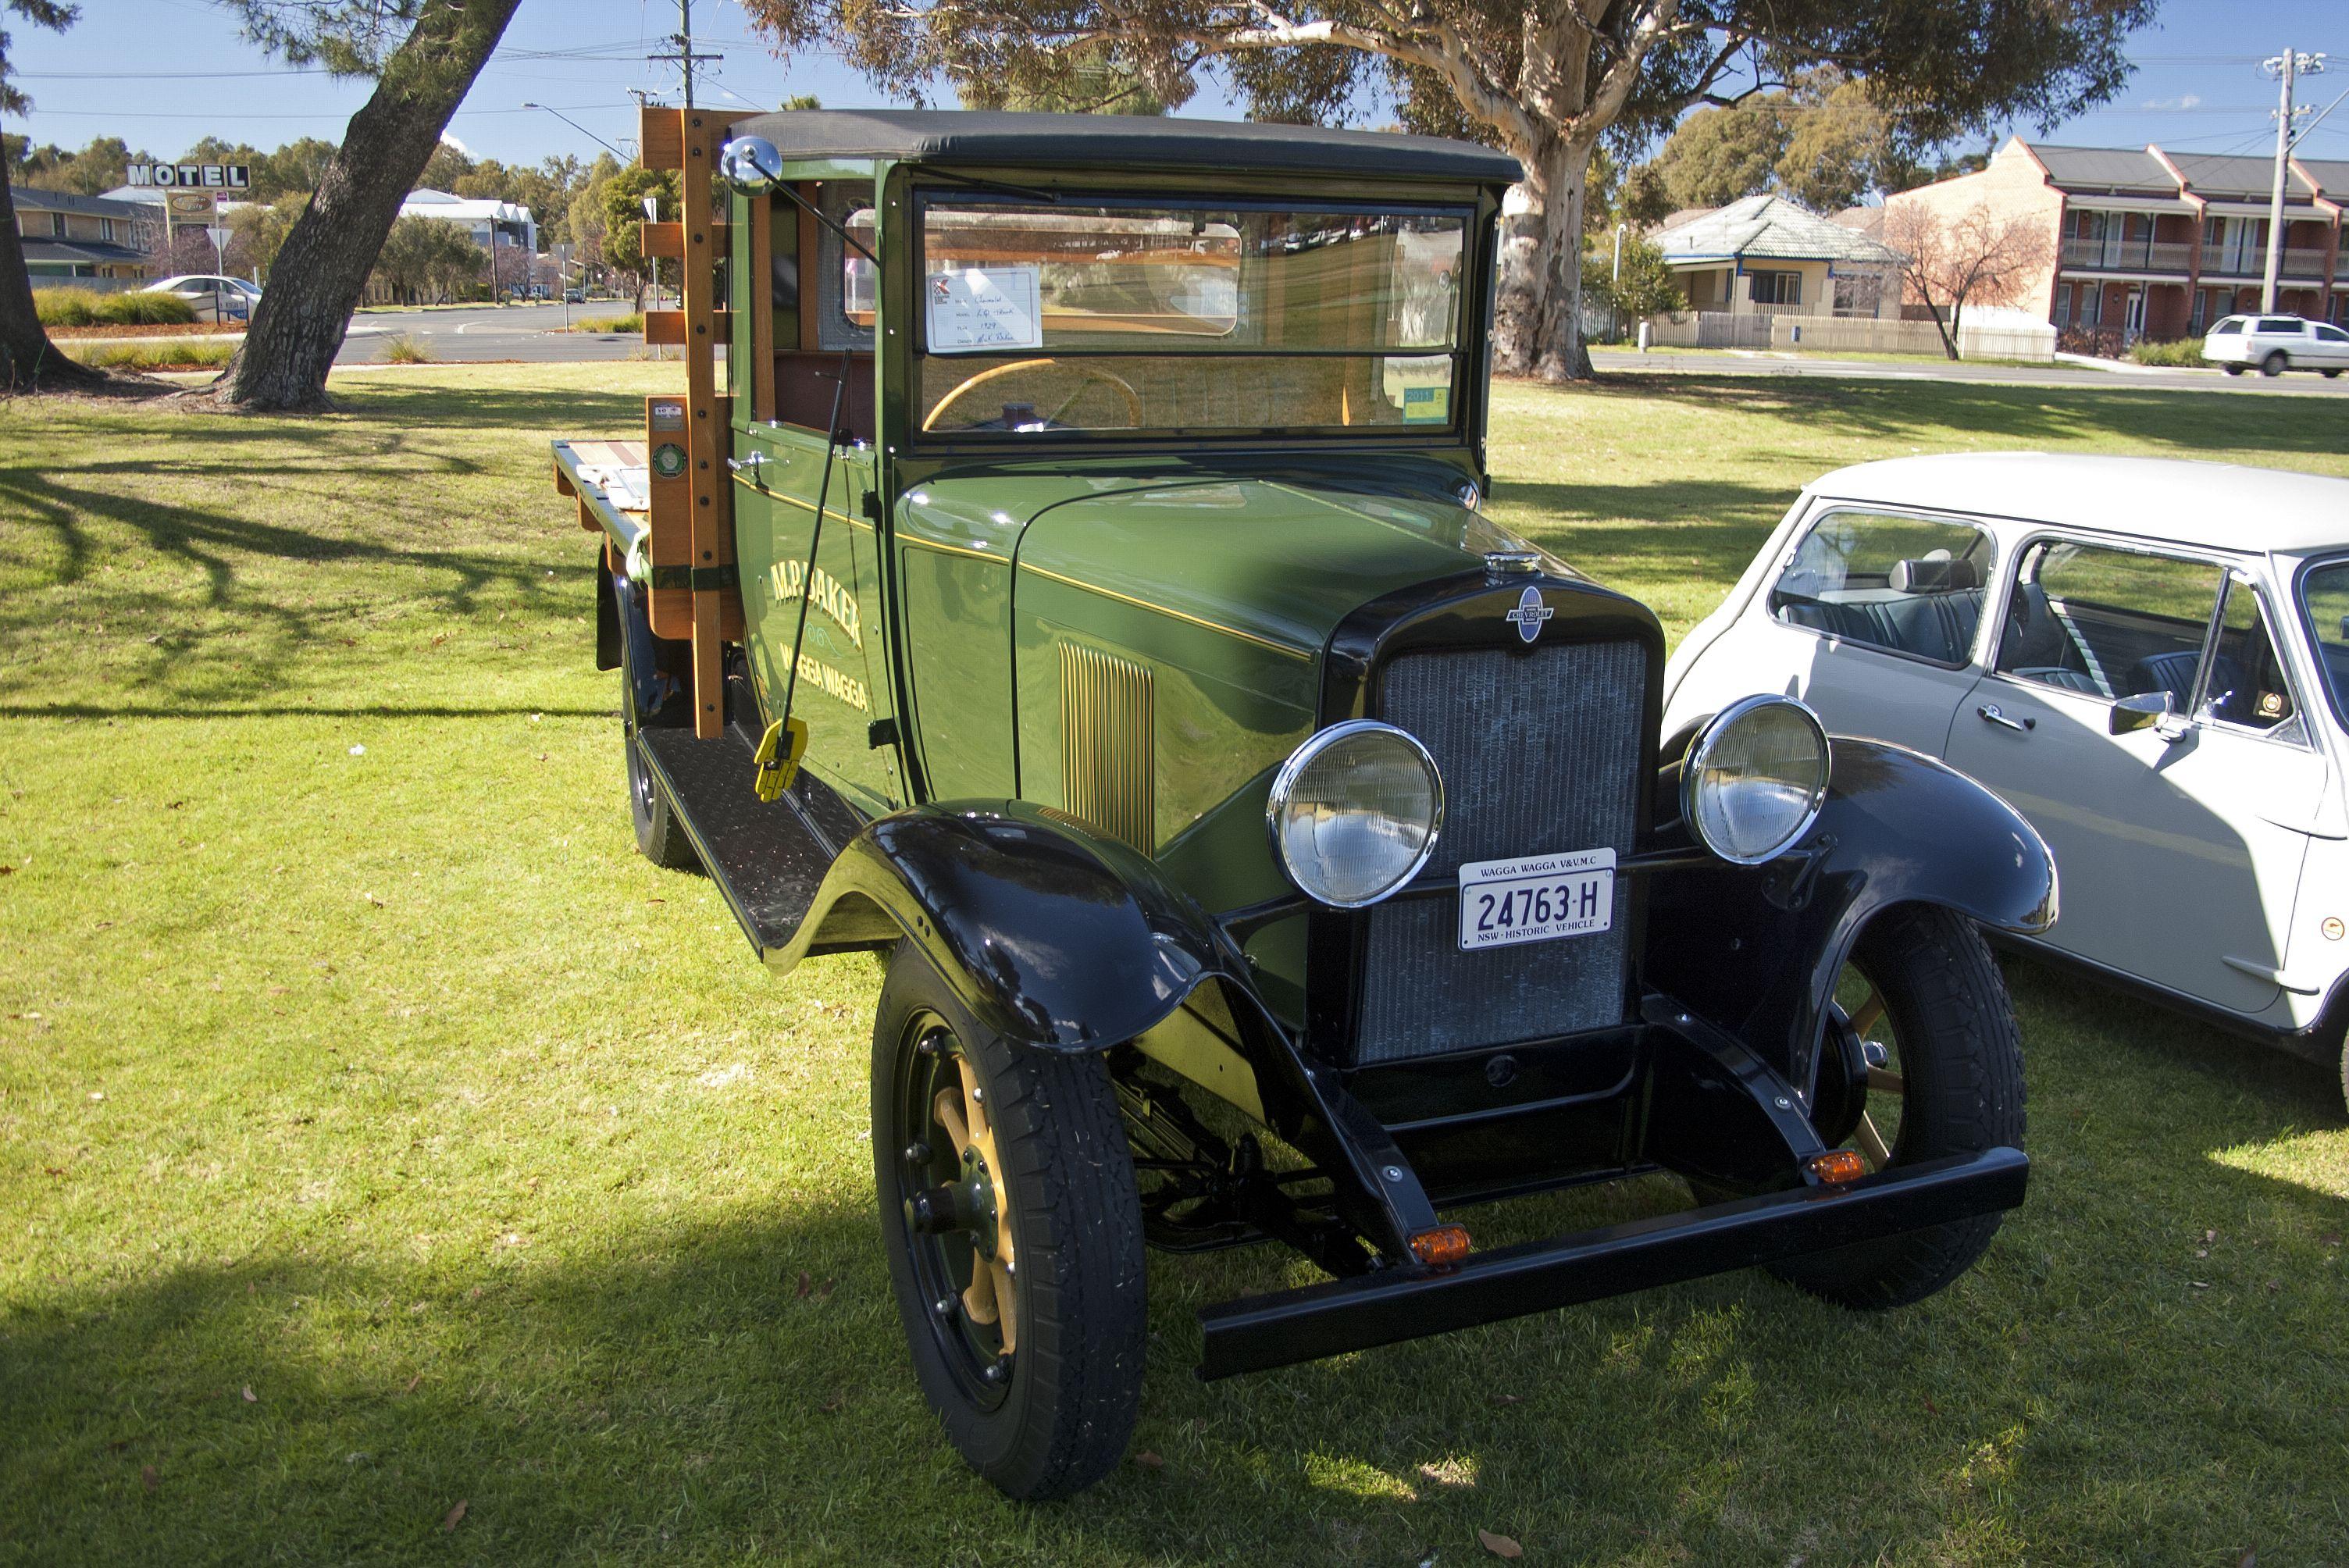 1929 Chev Holden Body Truck One Piece Cowl Version Chevy Trucks For Sale Chevy Trucks Chevy